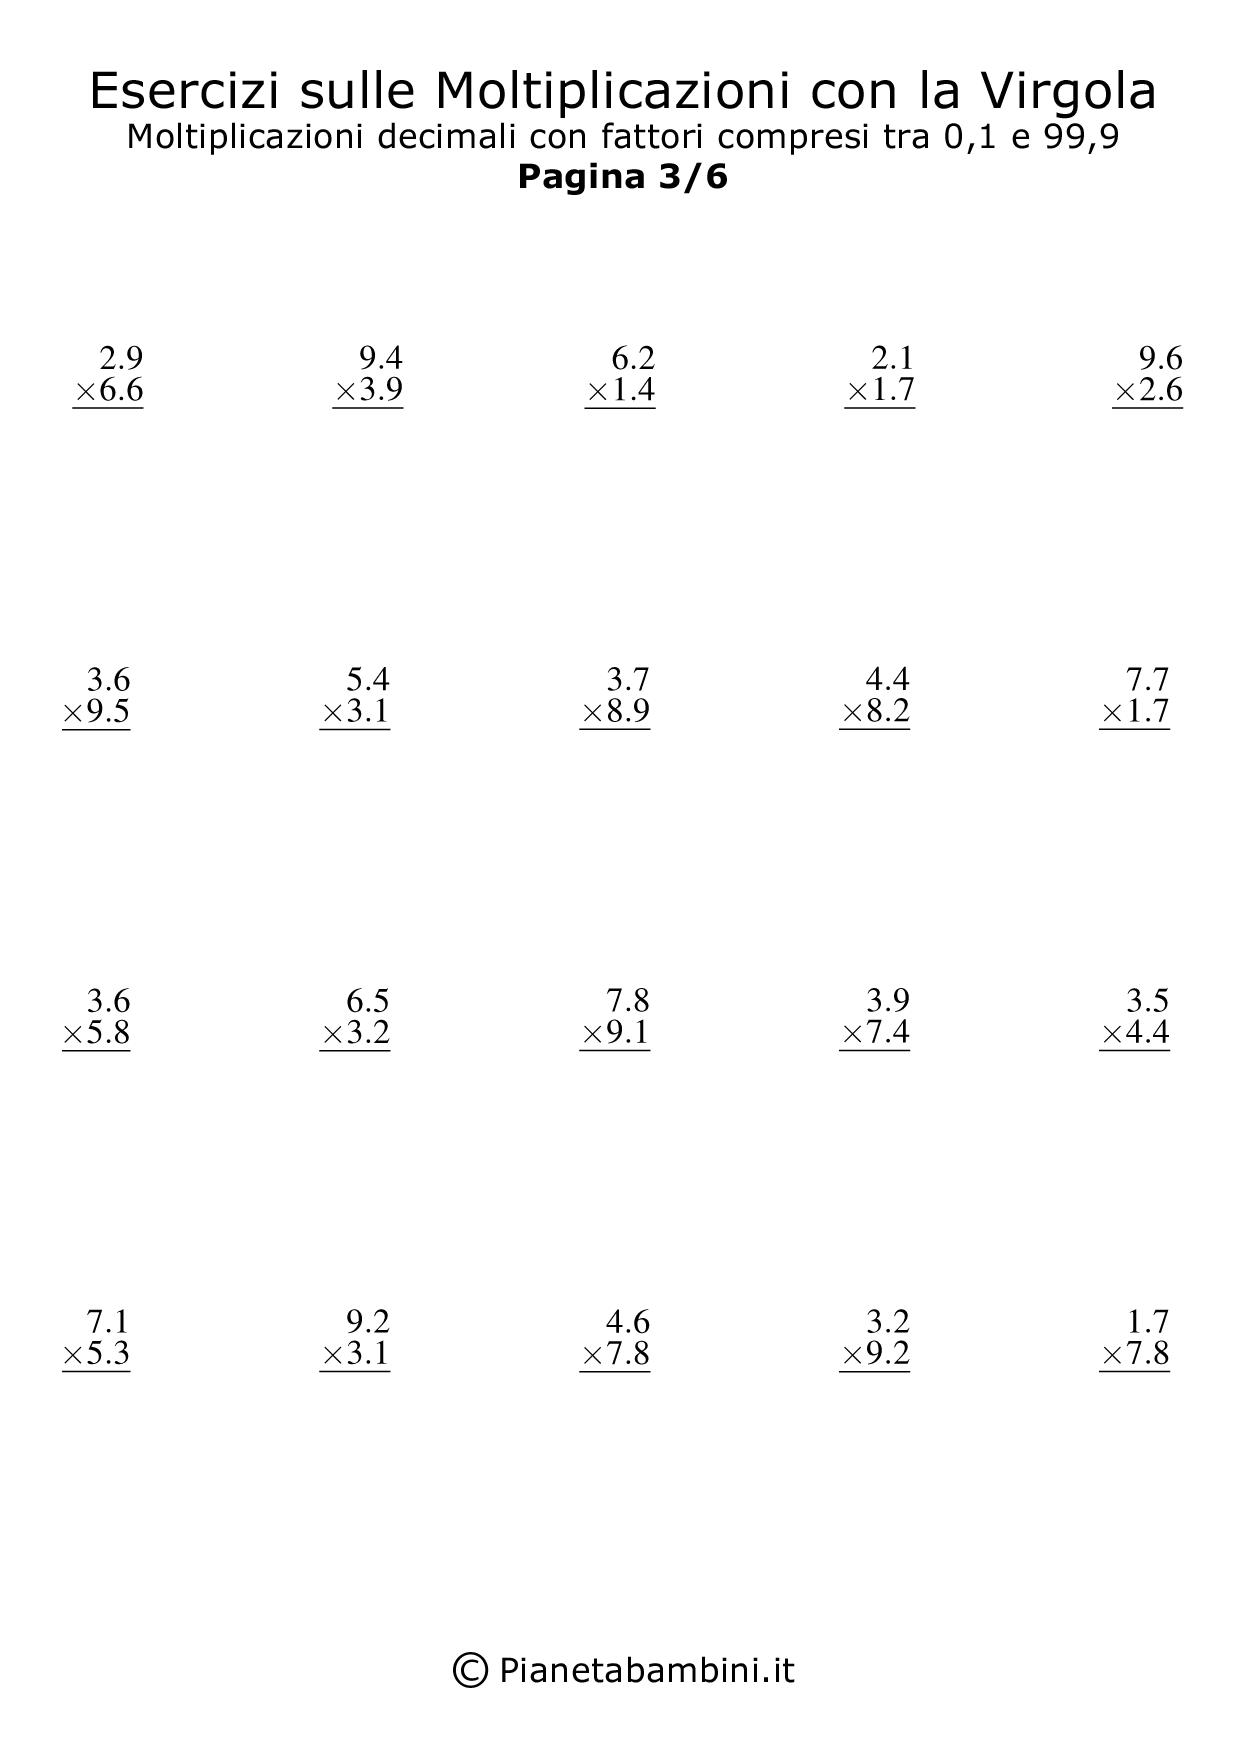 Moltiplicazioni-Virgola-0.1-99.9_3